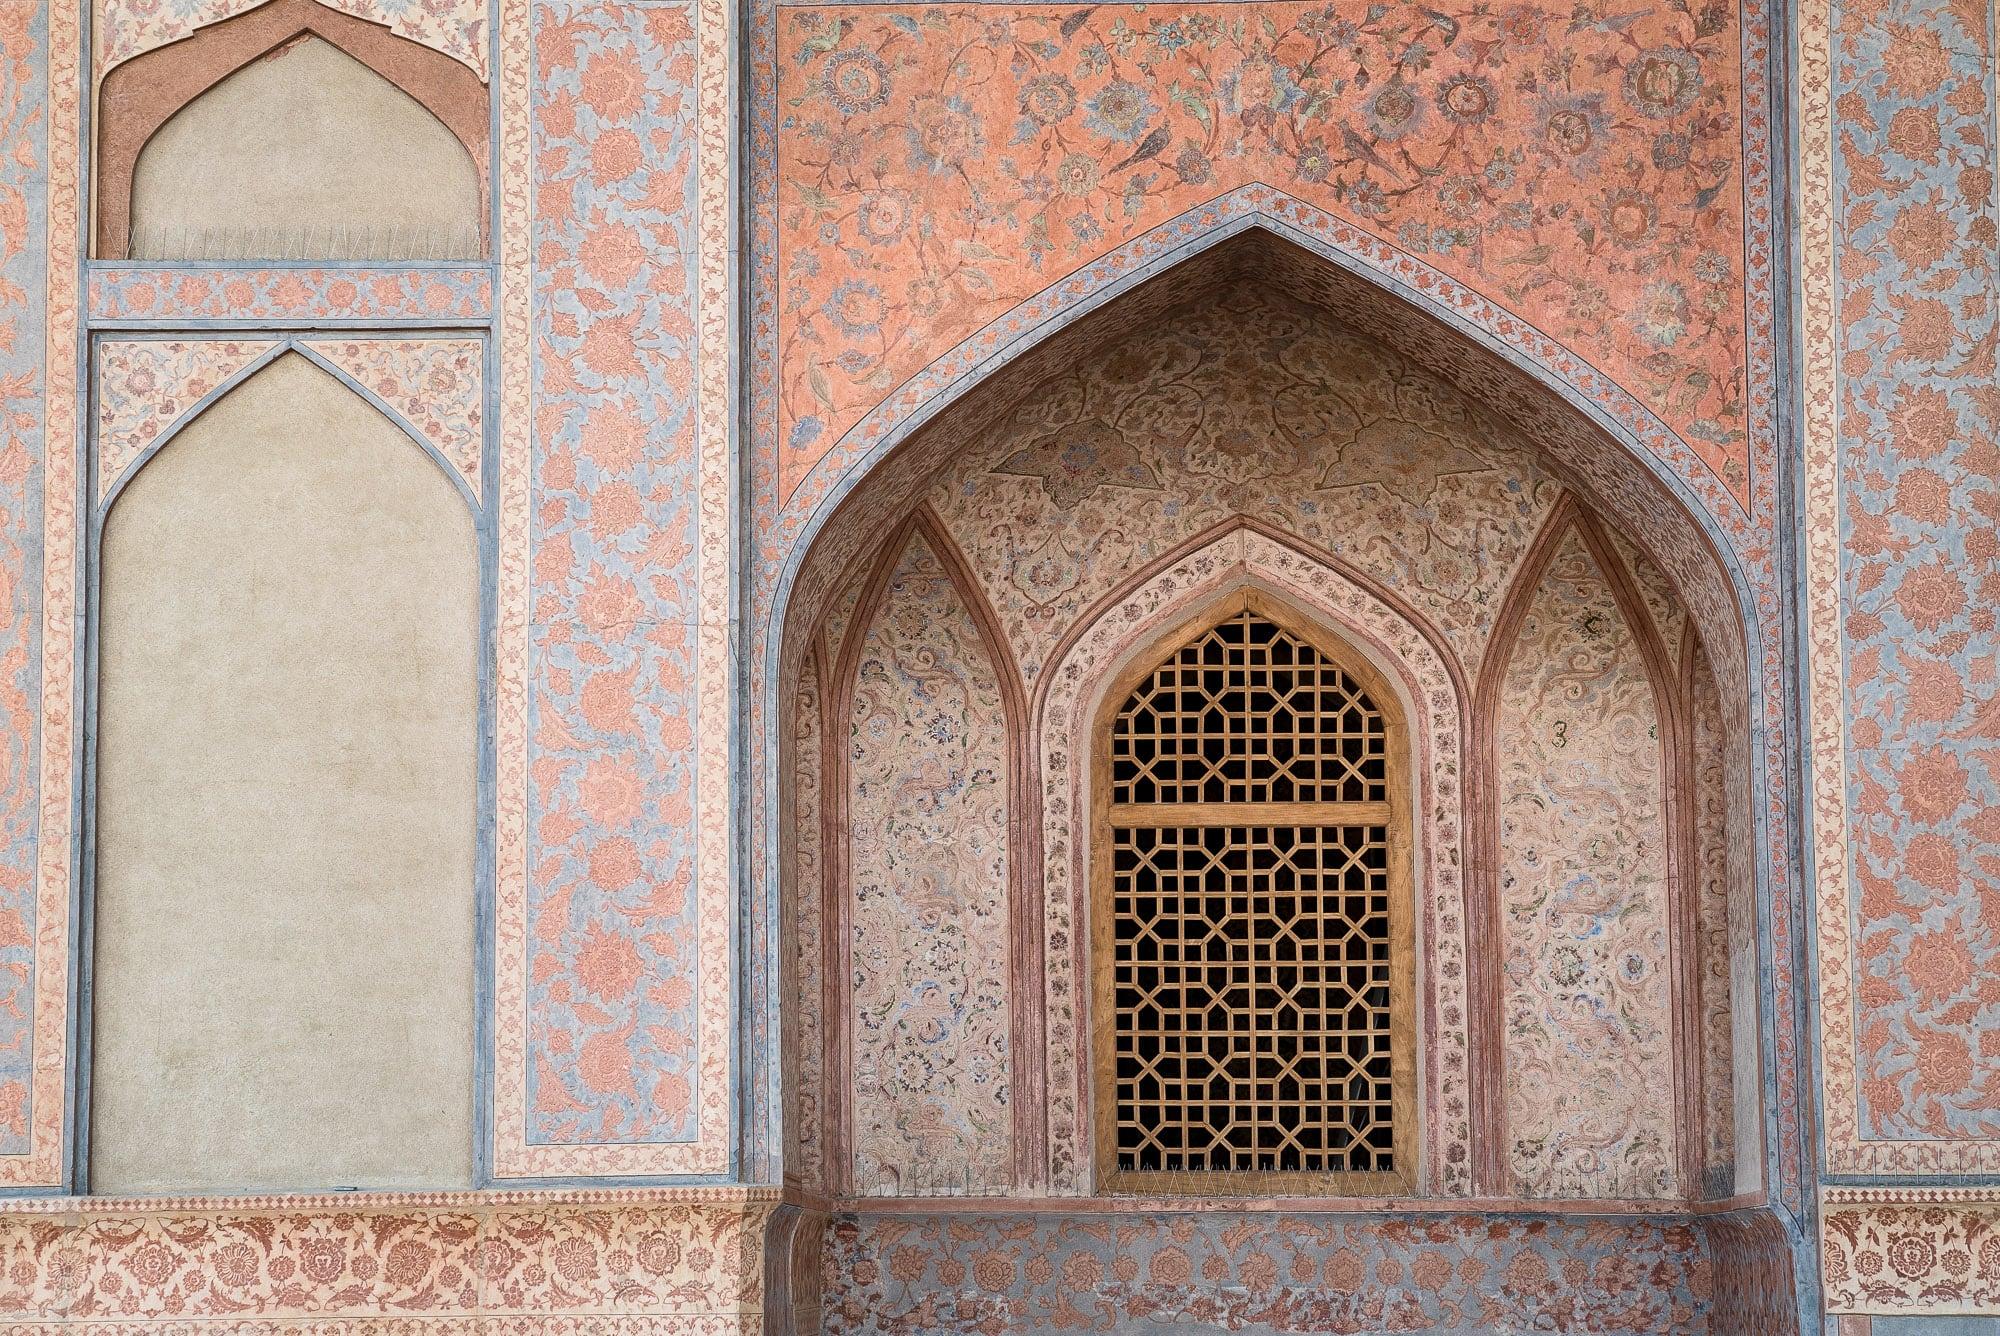 inside Aali Qapu Palace